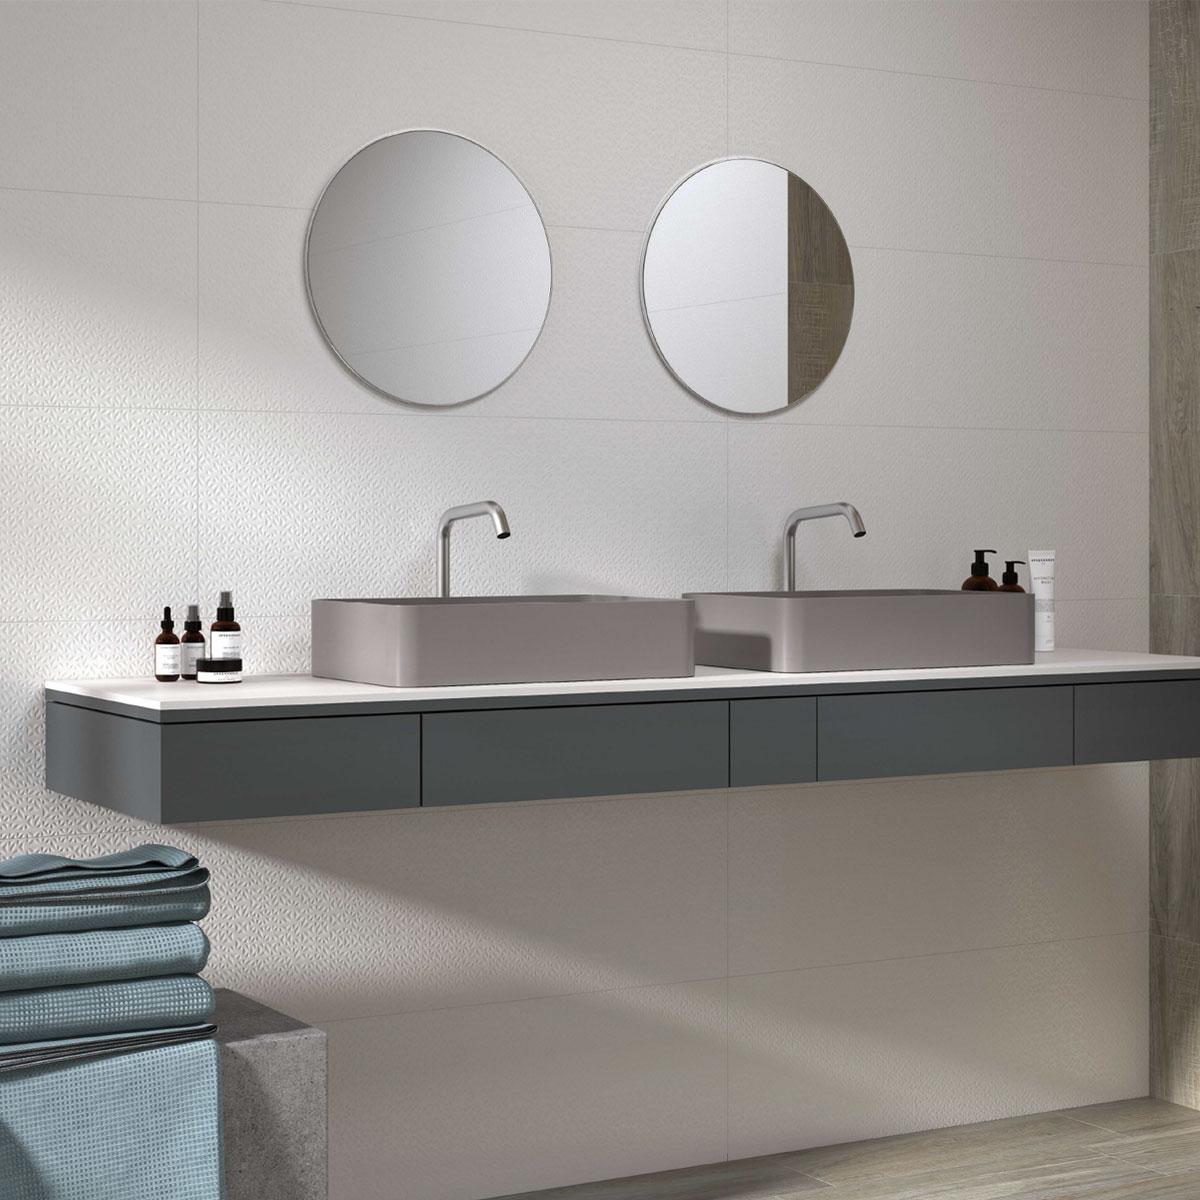 Arty - Kyoto White - Patterned Tiles - Stone3 Brisbane